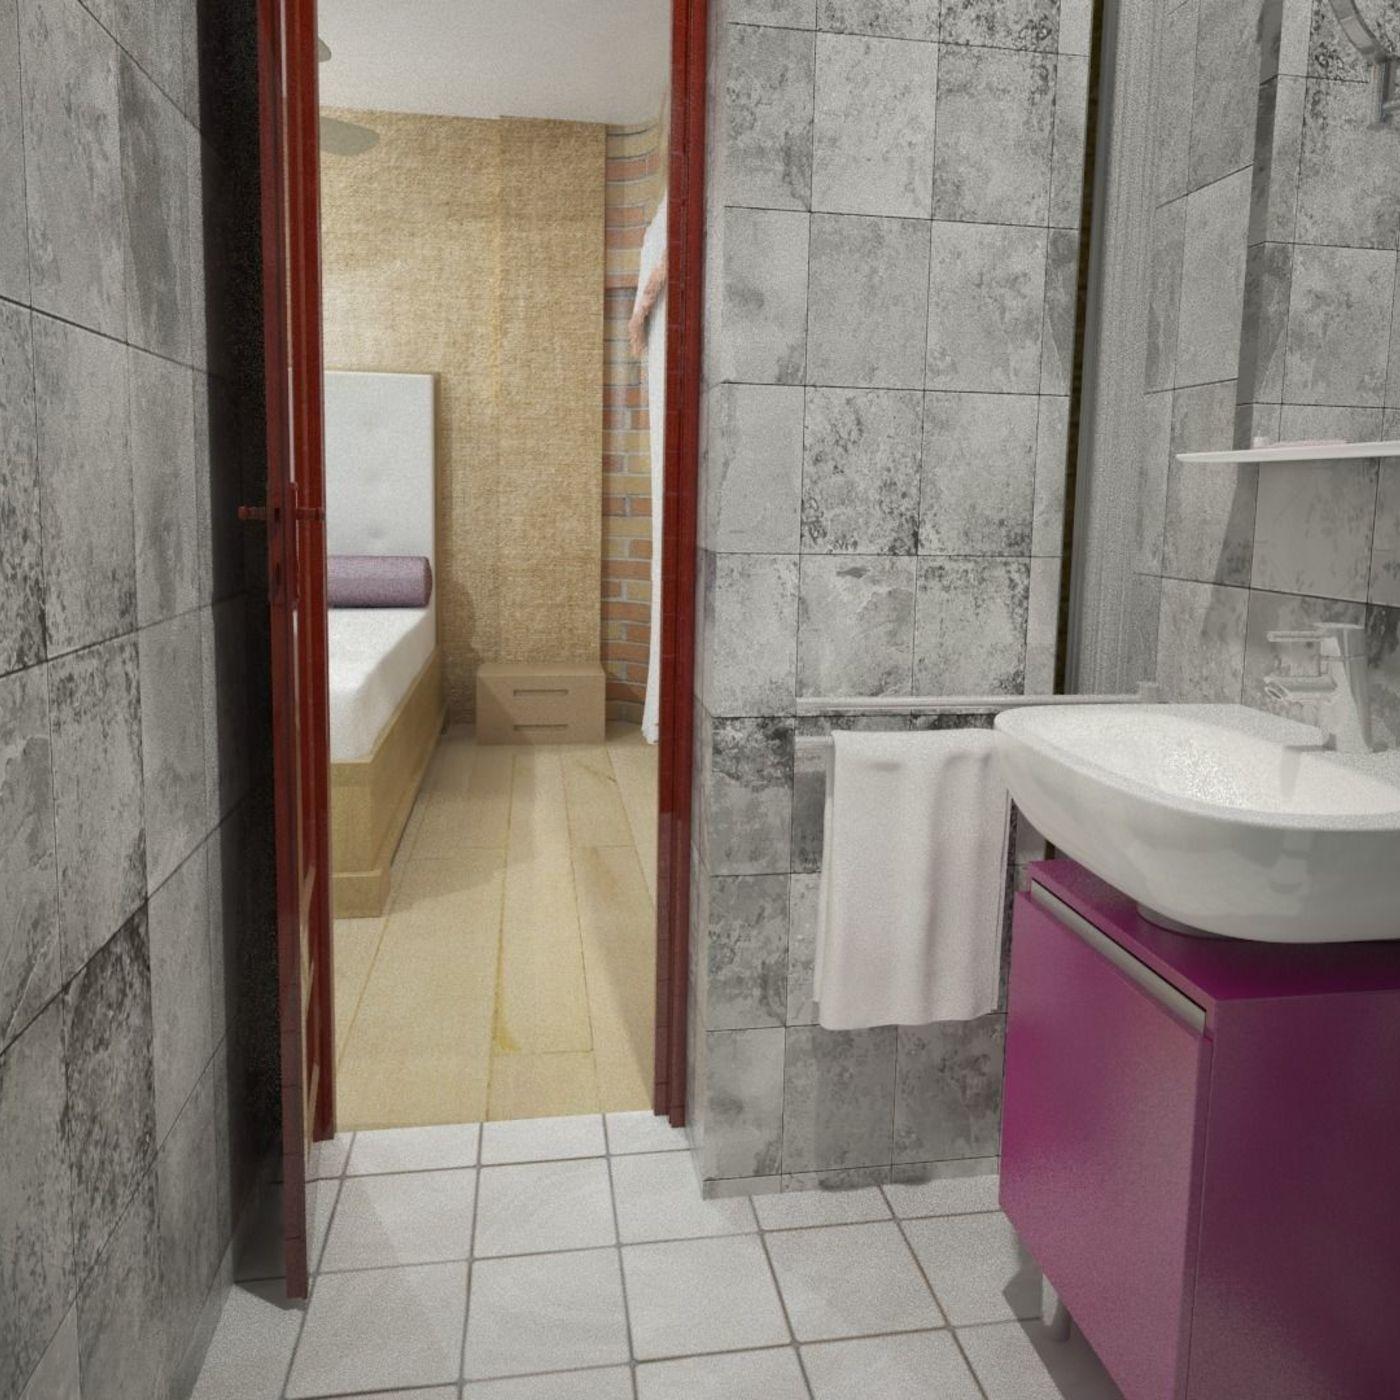 Floor/Booth/Interior